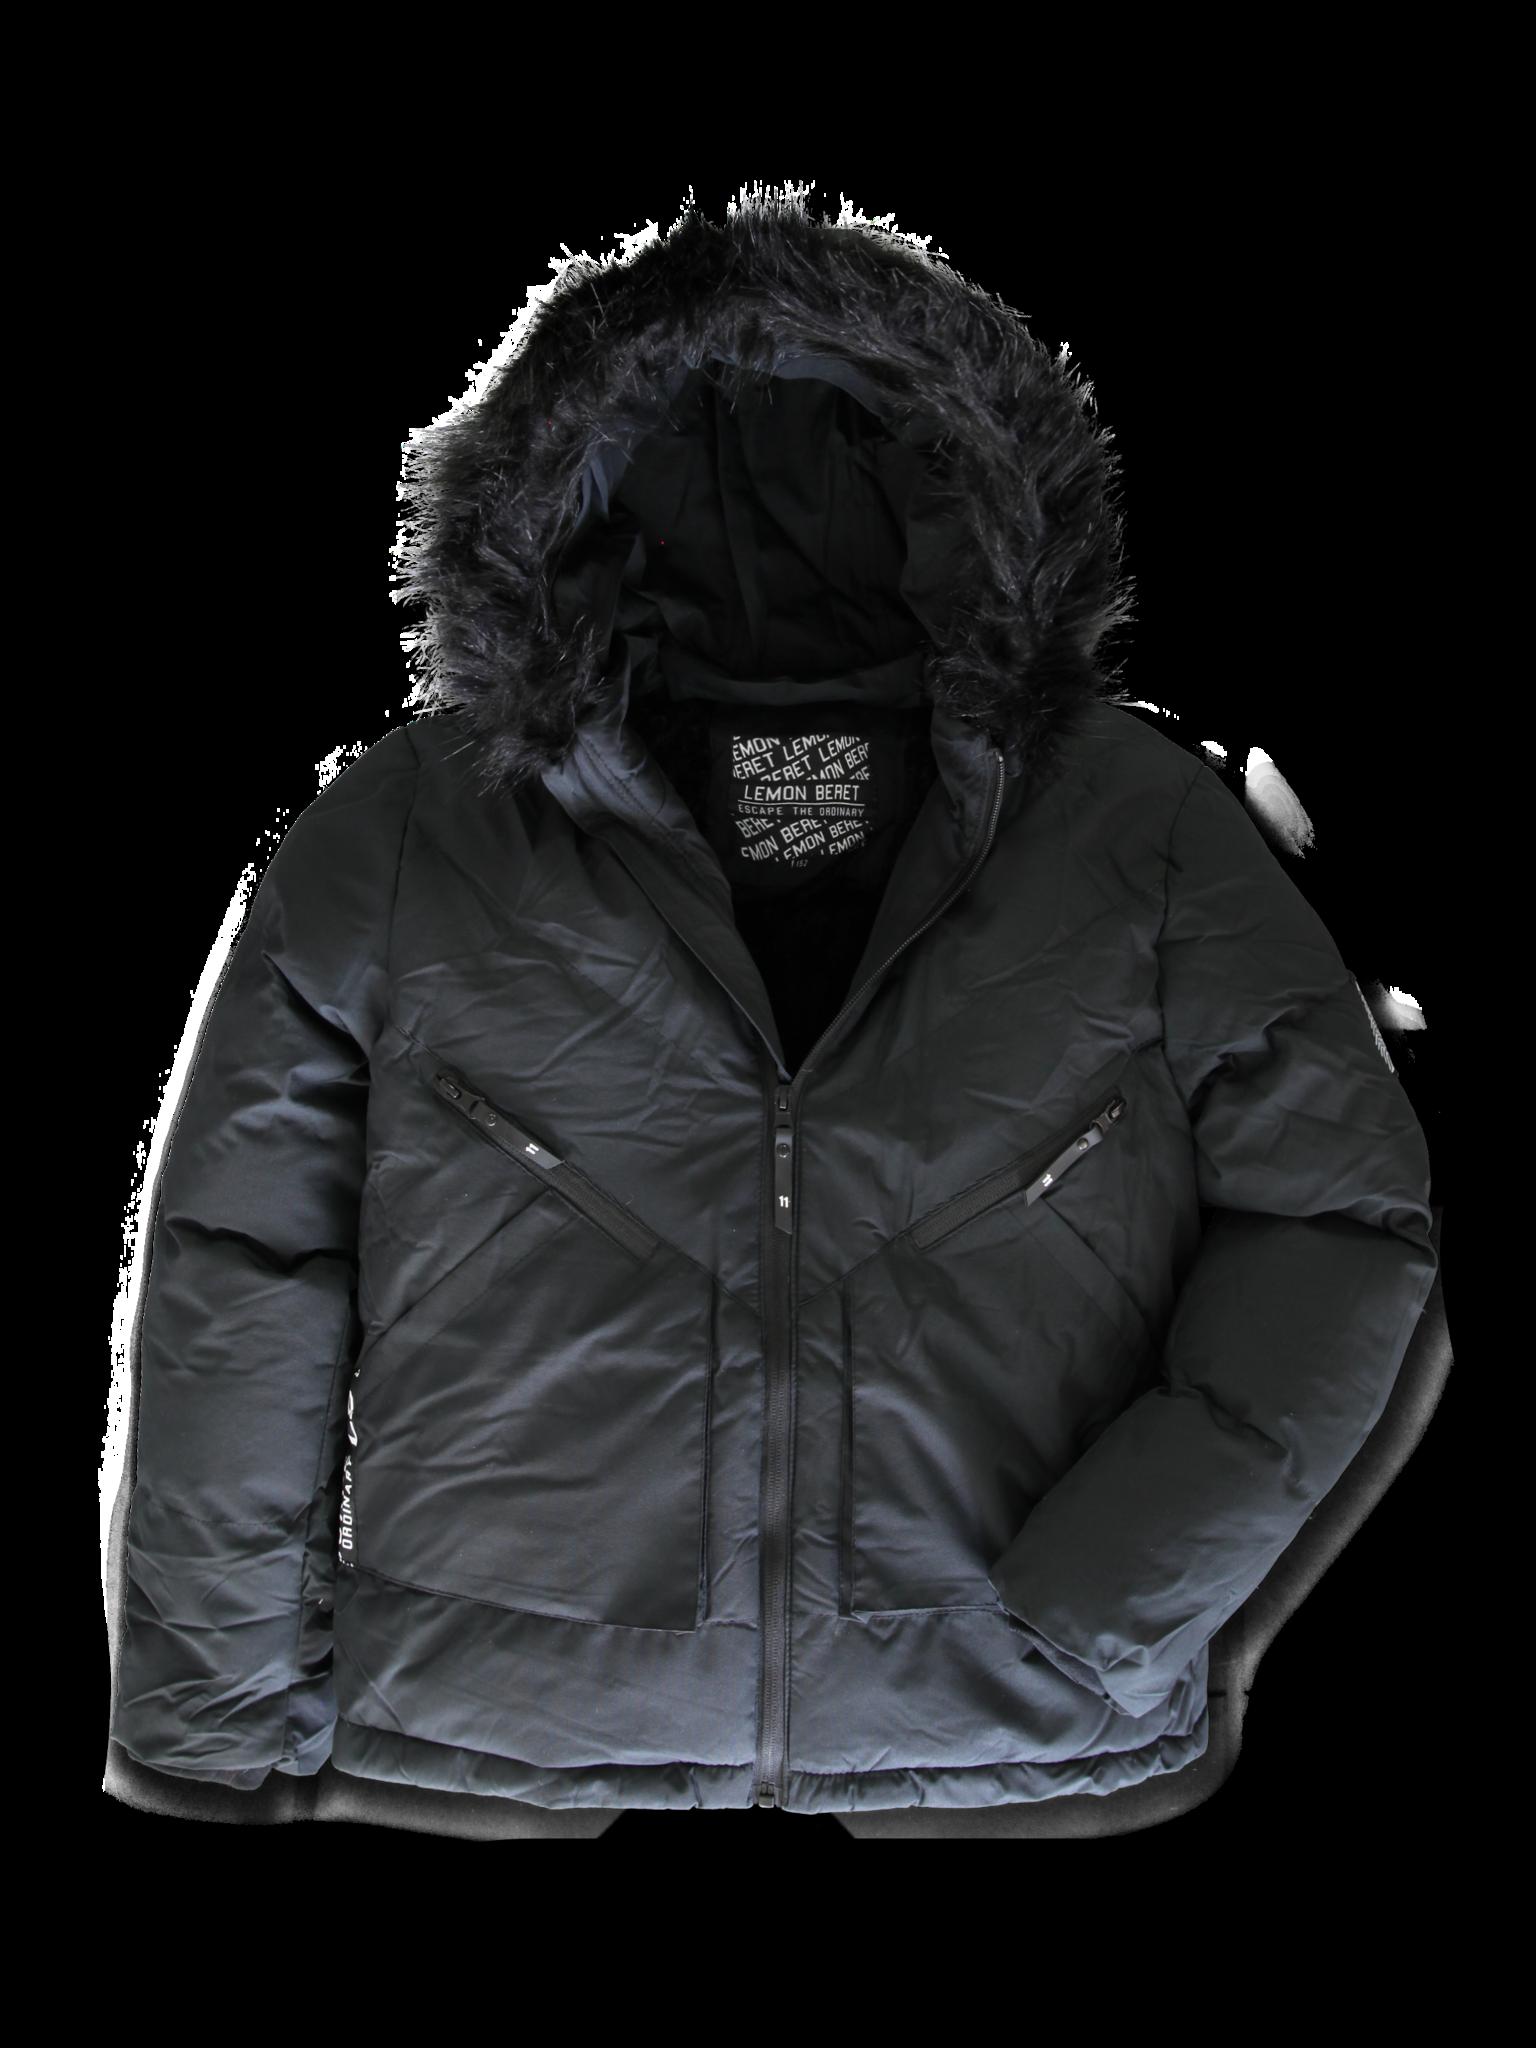 All Brands   Winterproducts Teen Boys   Jacket   10 pcs/box